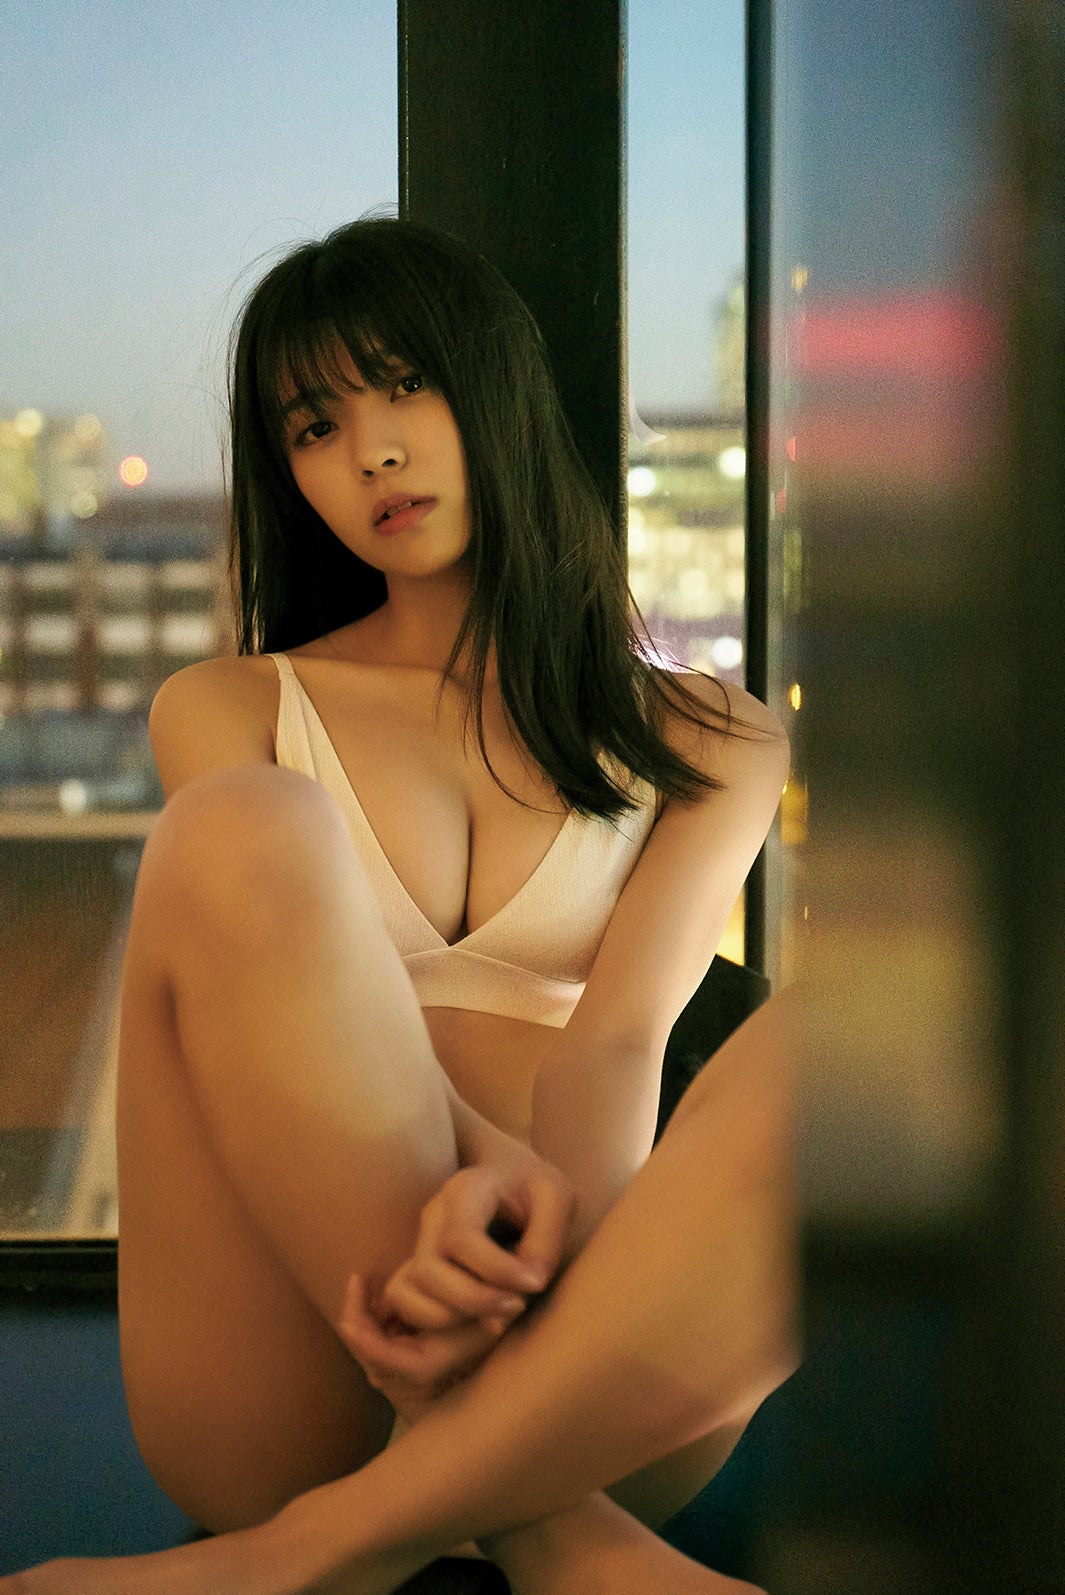 【NHK】坂道テレビ【乃木欅日向】反省会場